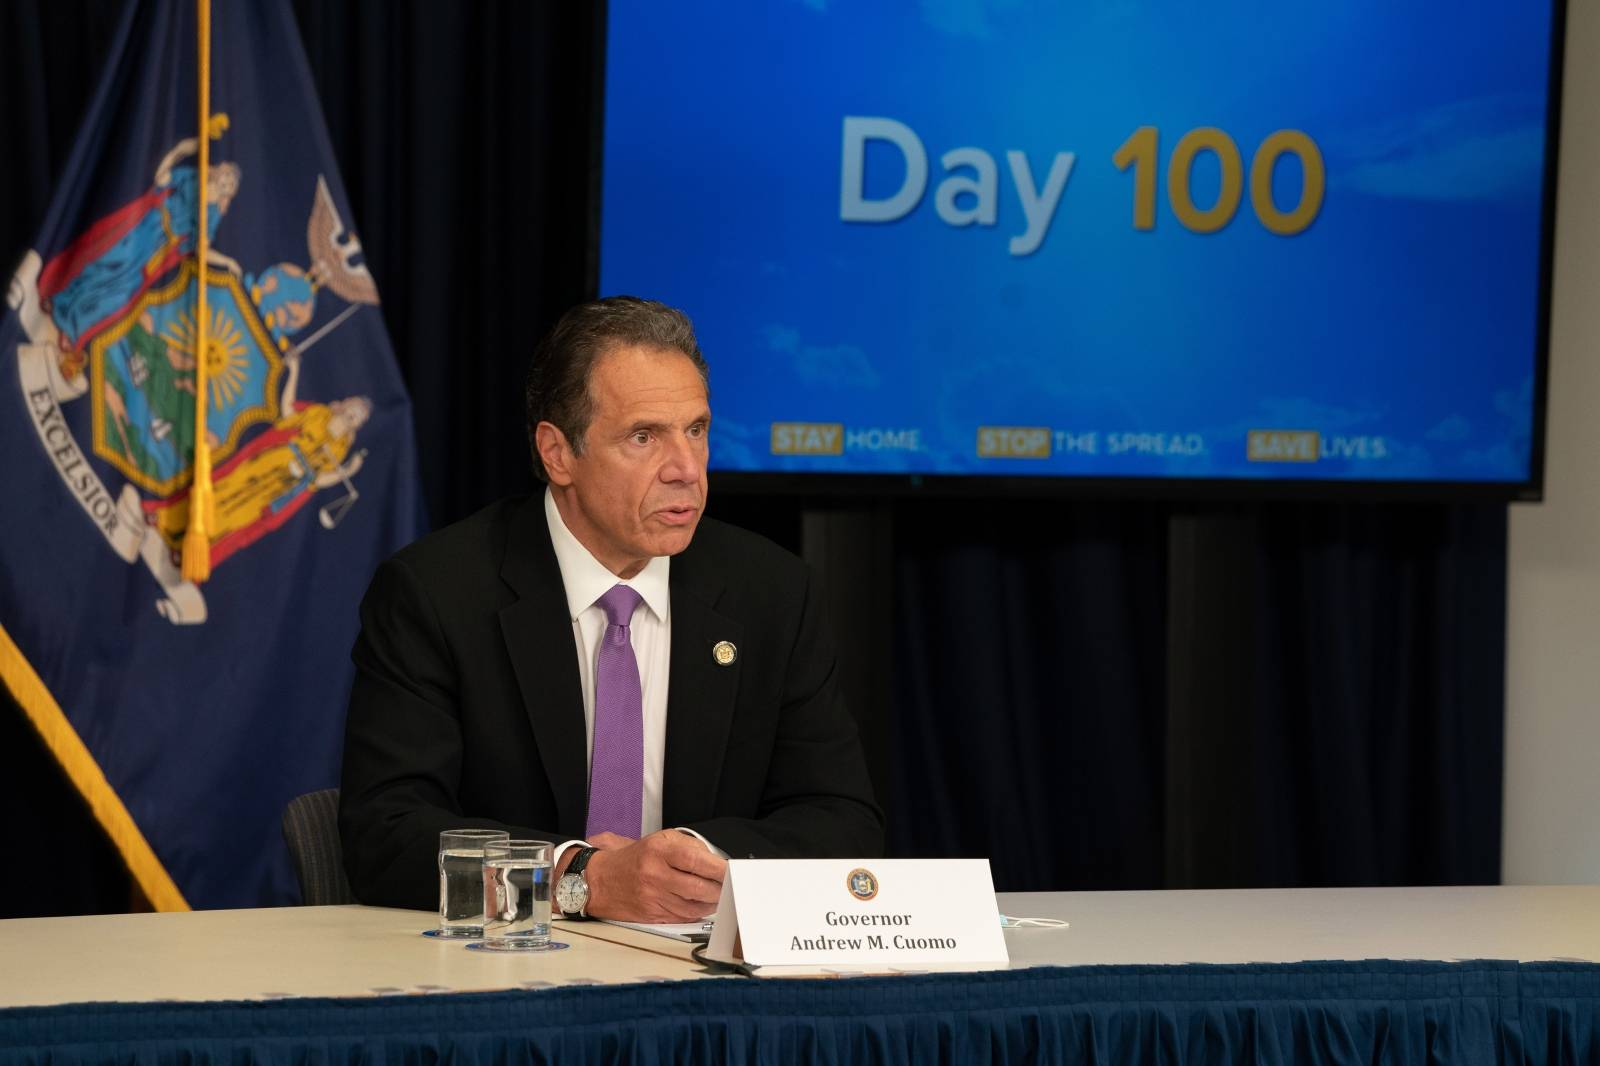 Le briefing quotidien du gouverneur de New York Andrew Cuomo sur le coronavirus (COVID-19)